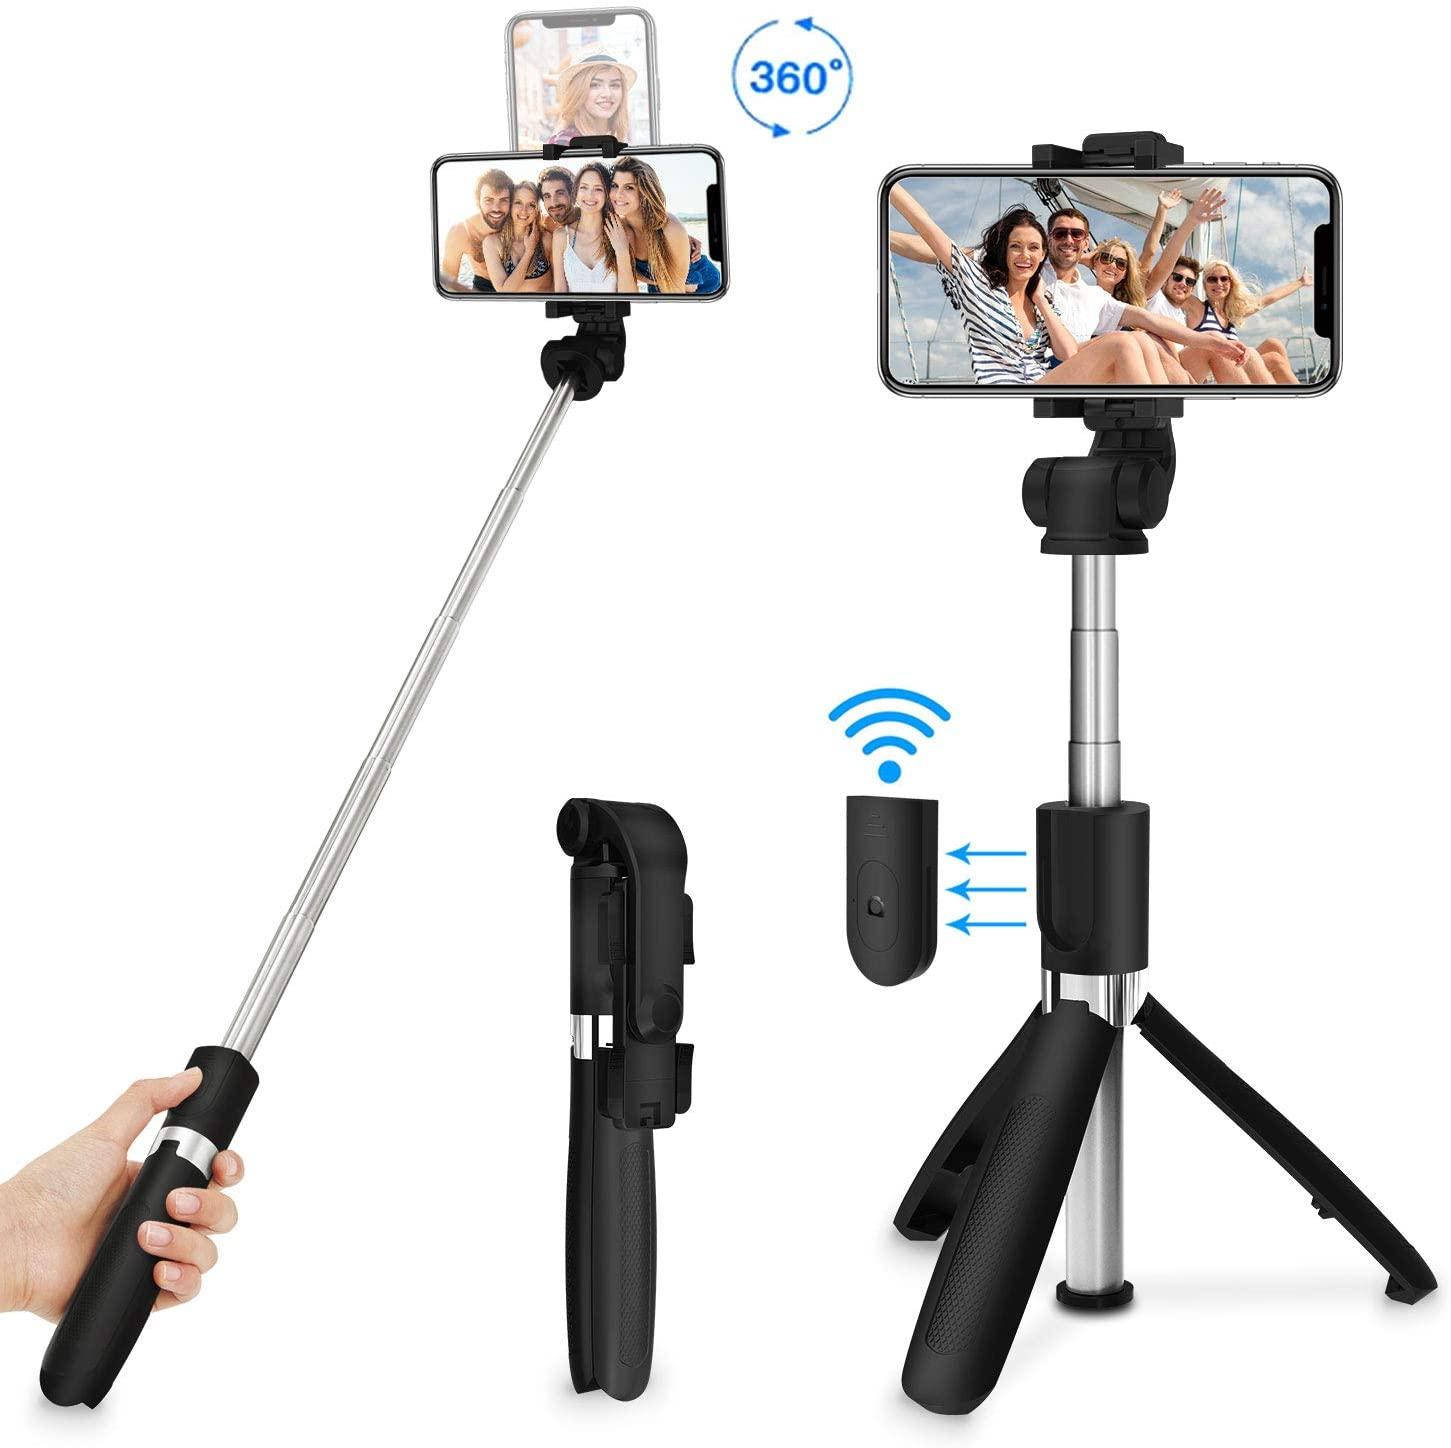 MPOW Selfie Stick Tripod 3 in 1